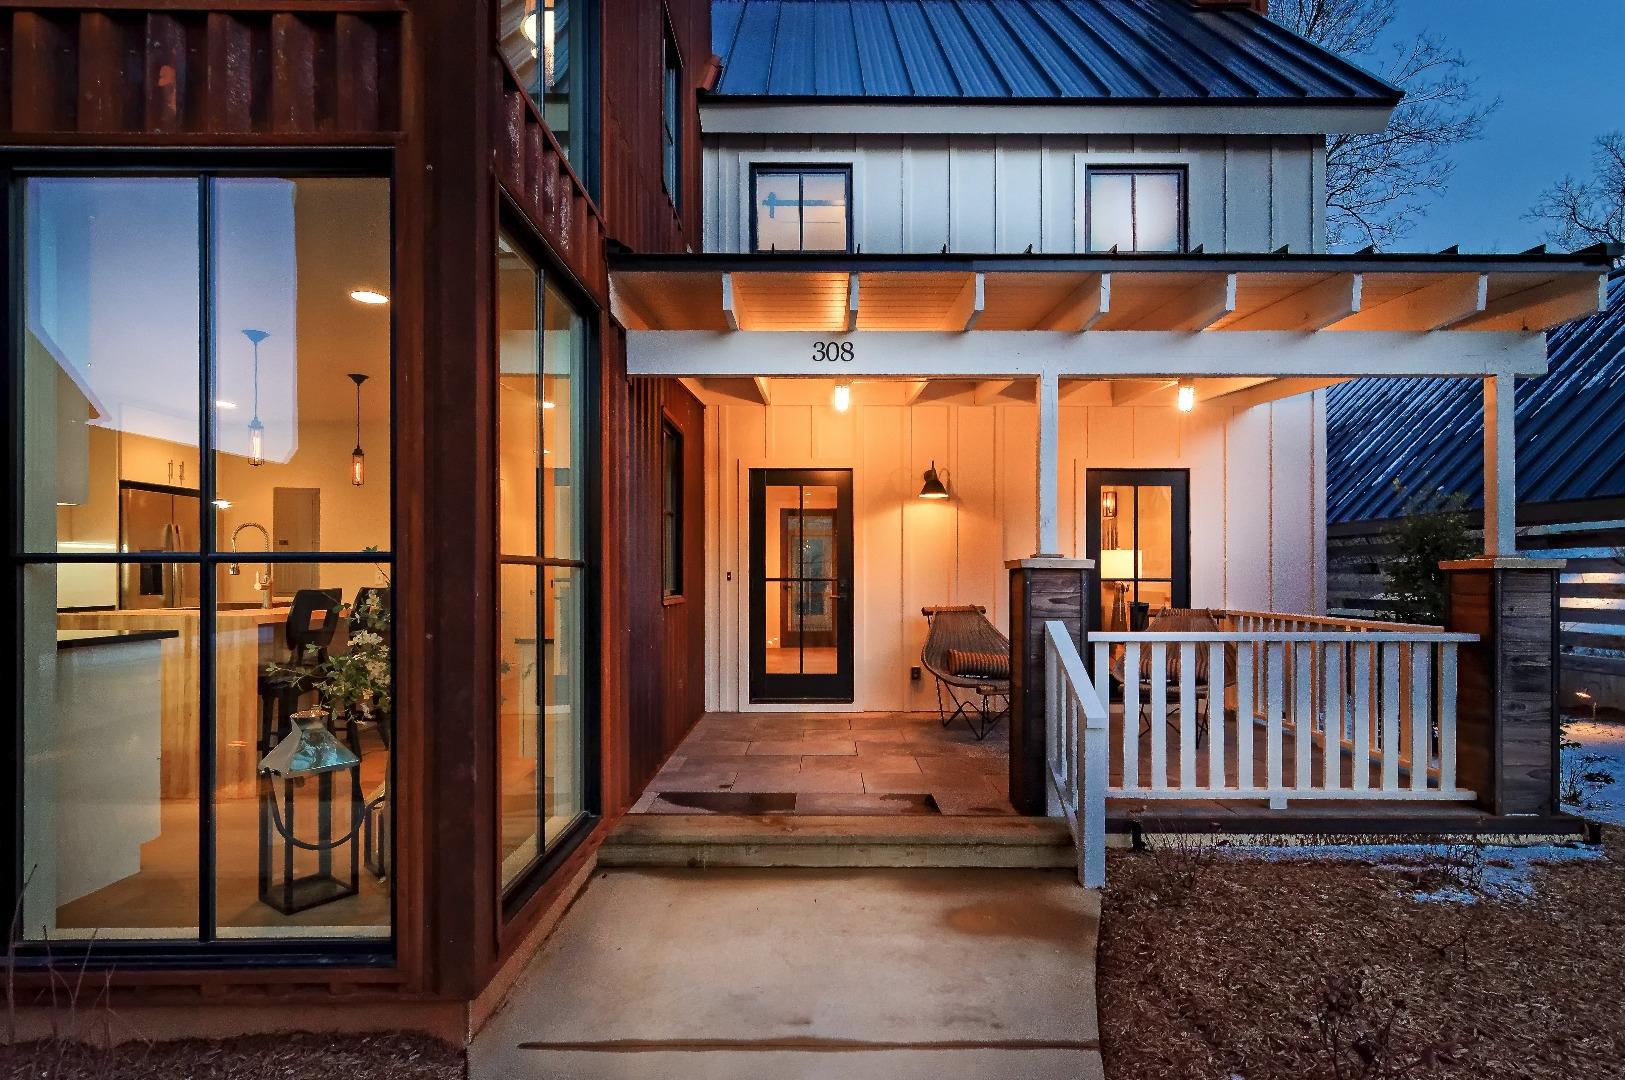 NexGen Home Loans Inc. slide #4